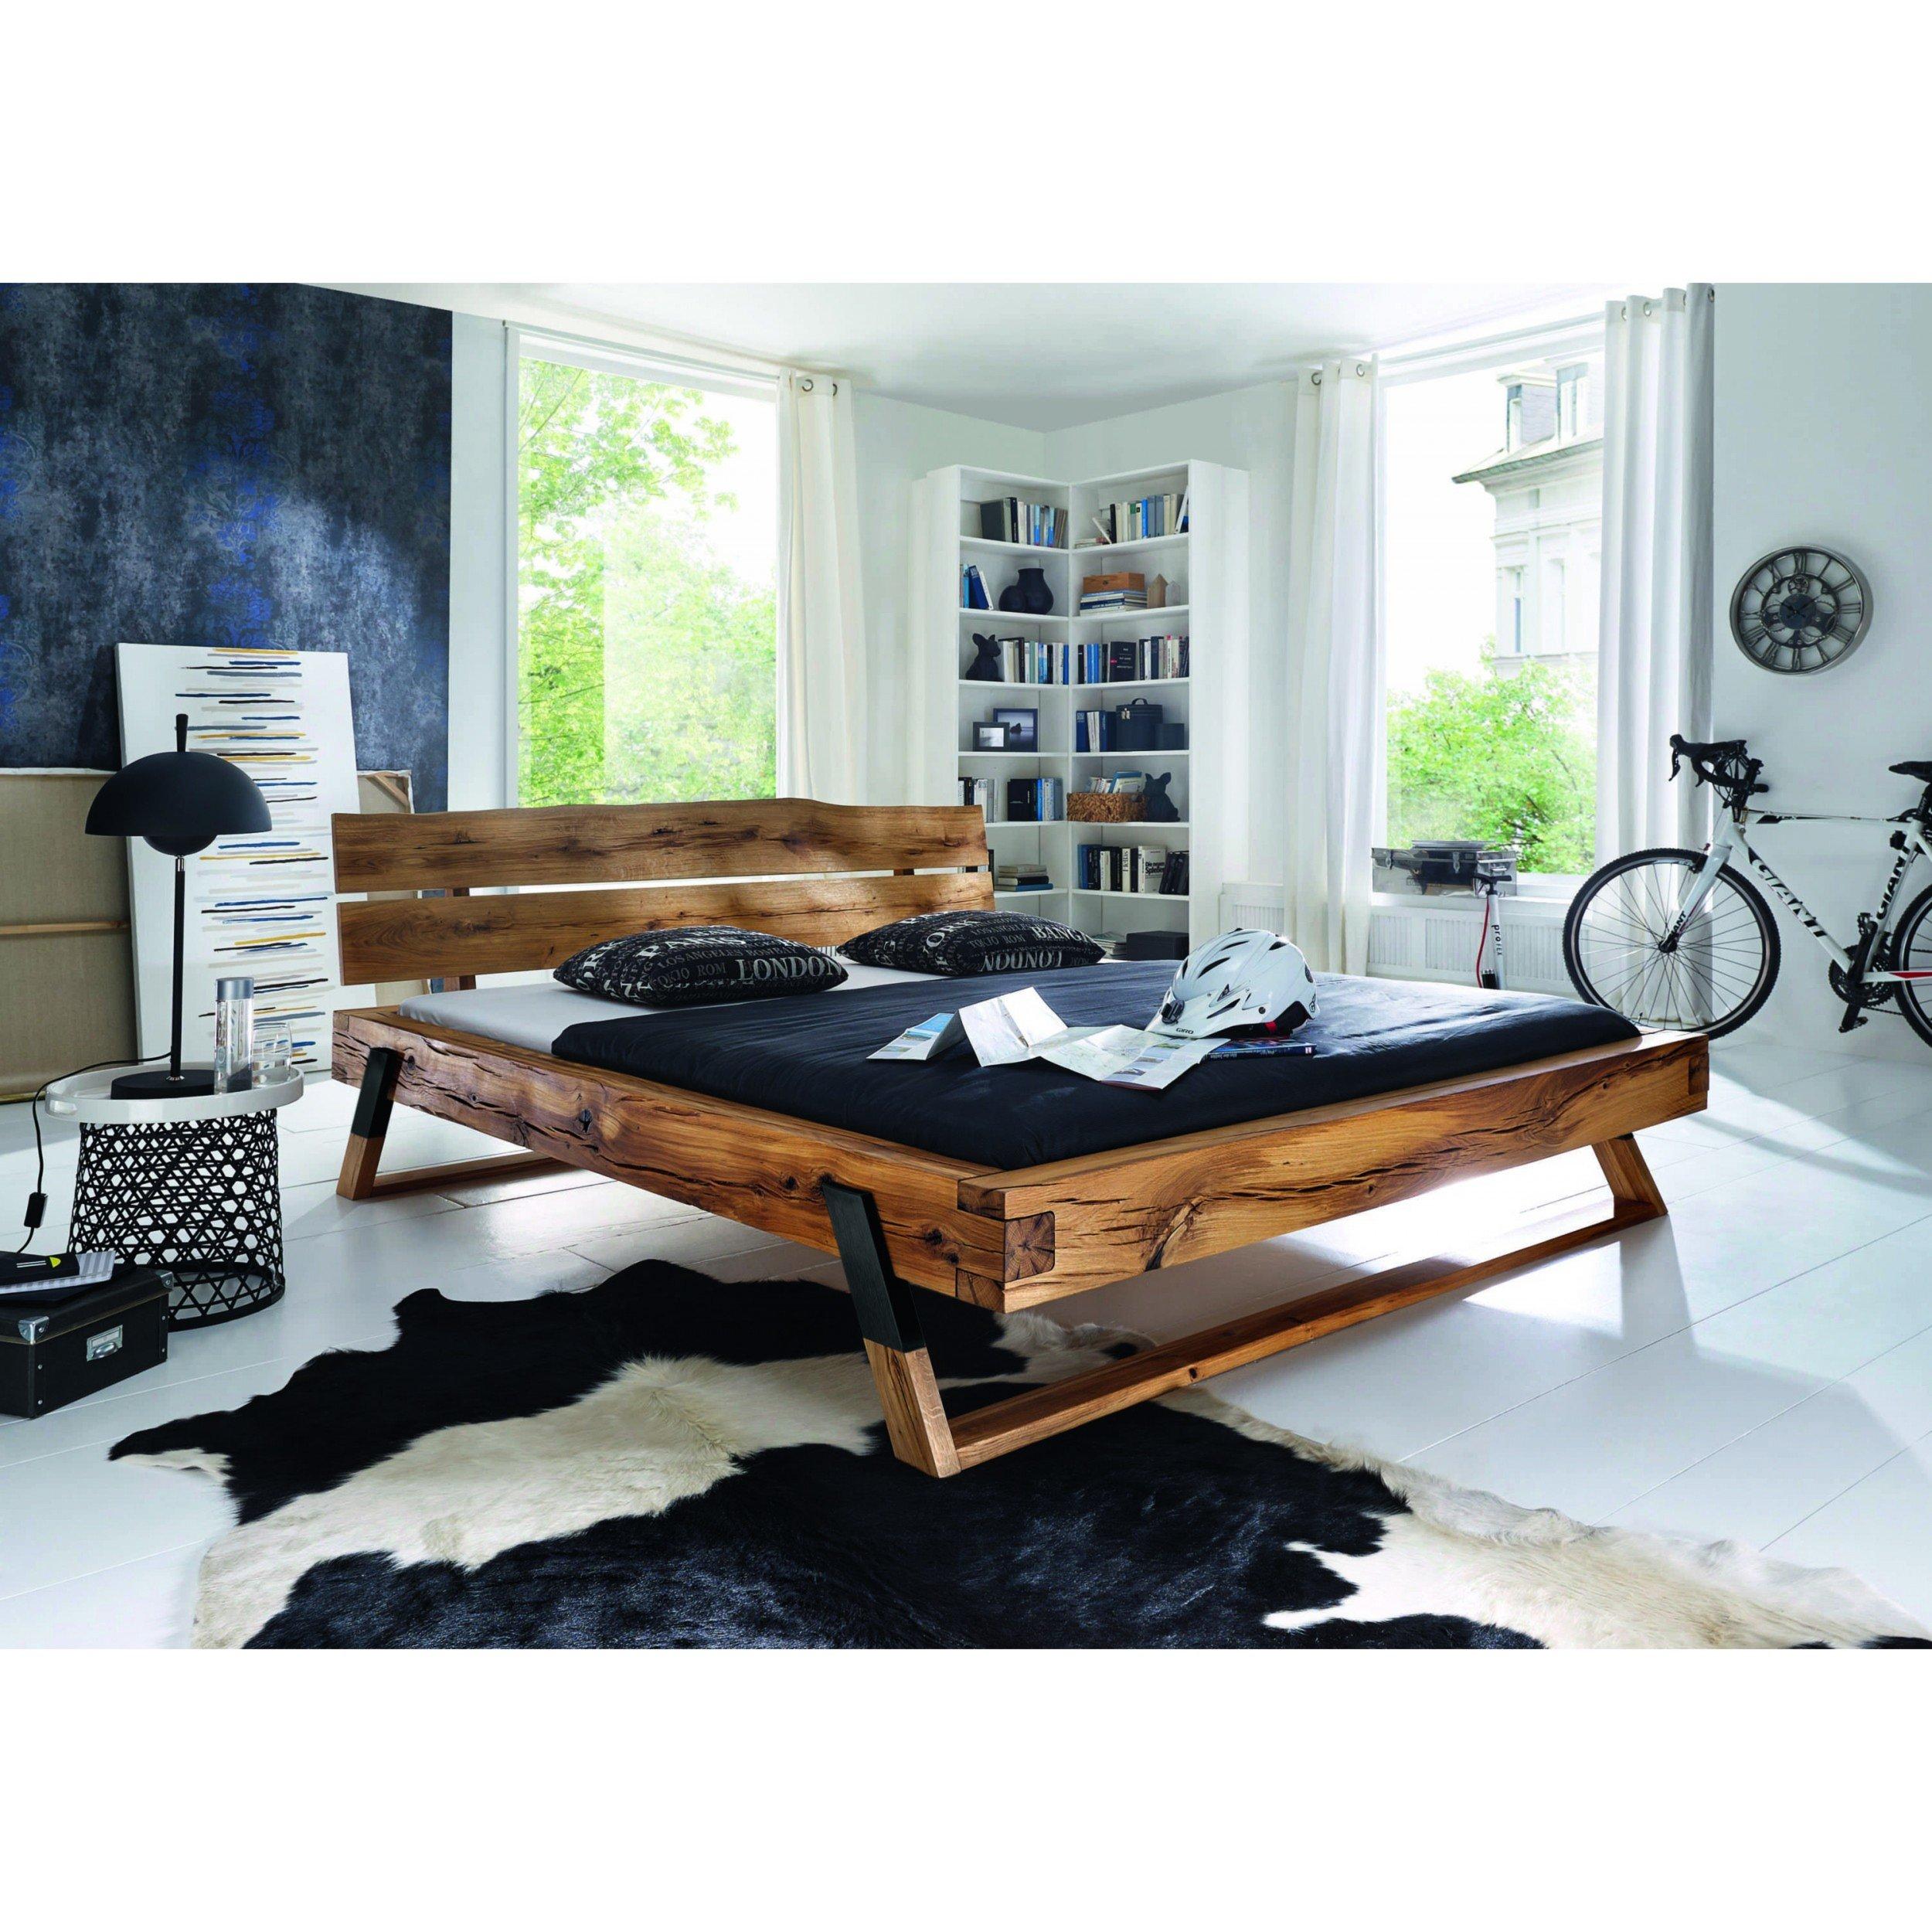 massivholzbett wildeiche ge lt 180x200cm inkl lieferung segm ller online. Black Bedroom Furniture Sets. Home Design Ideas